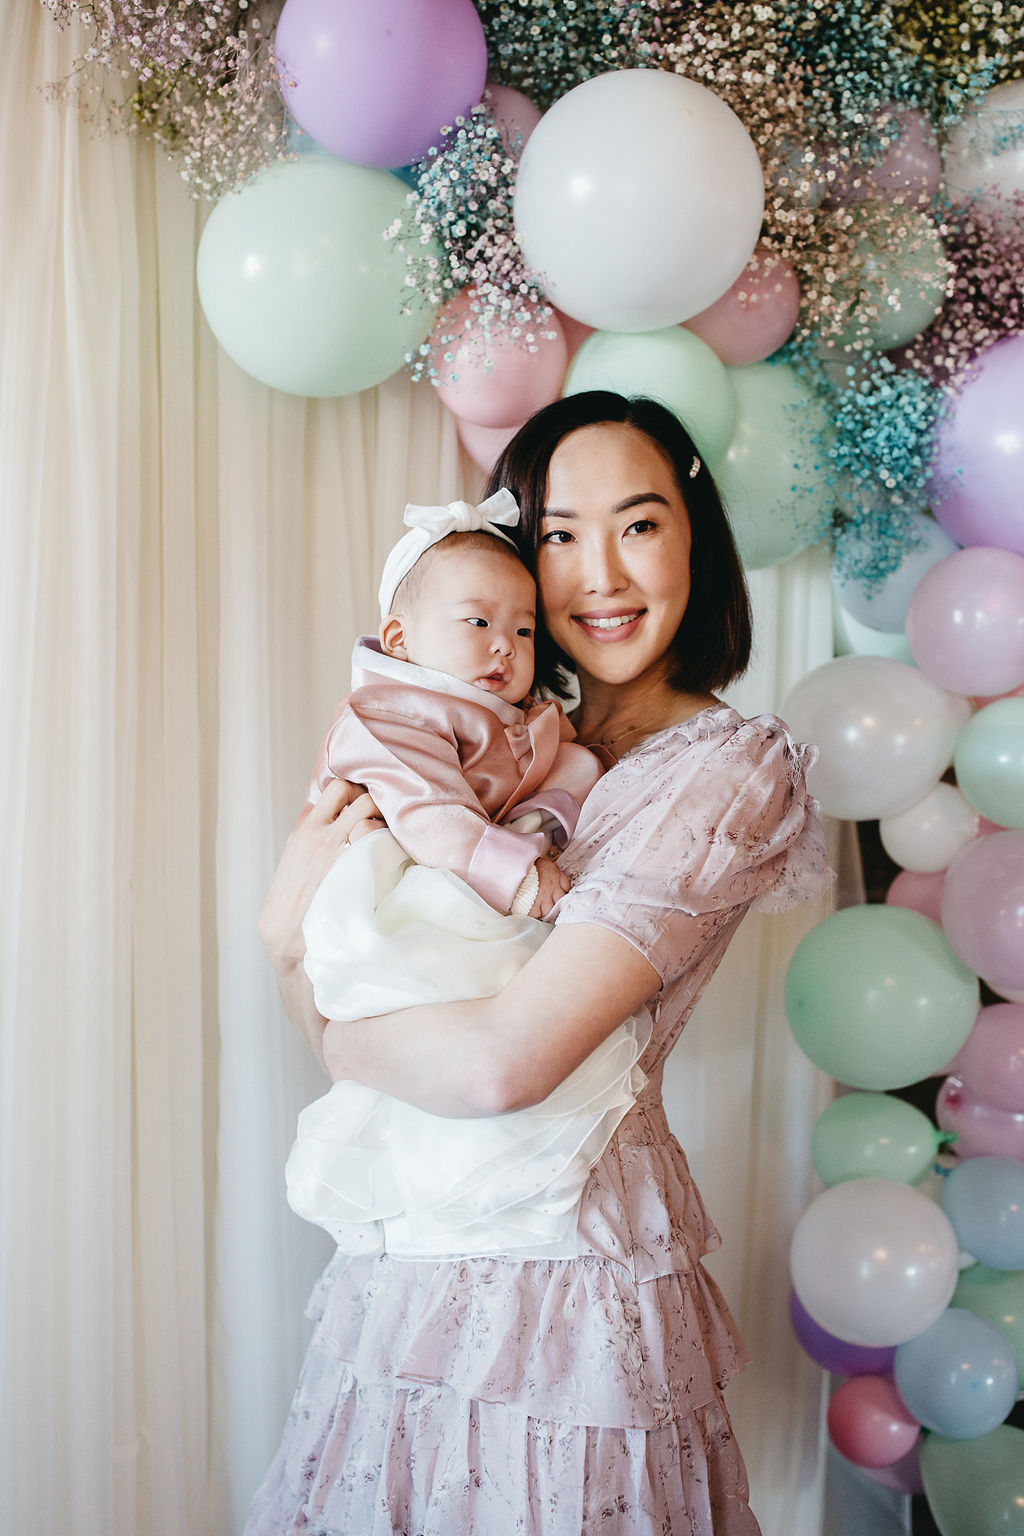 14 Colette Chloe Chriselle Lim Unicorn Girls Party OC LA Lifestyle Event Photographer Joy Theory Co